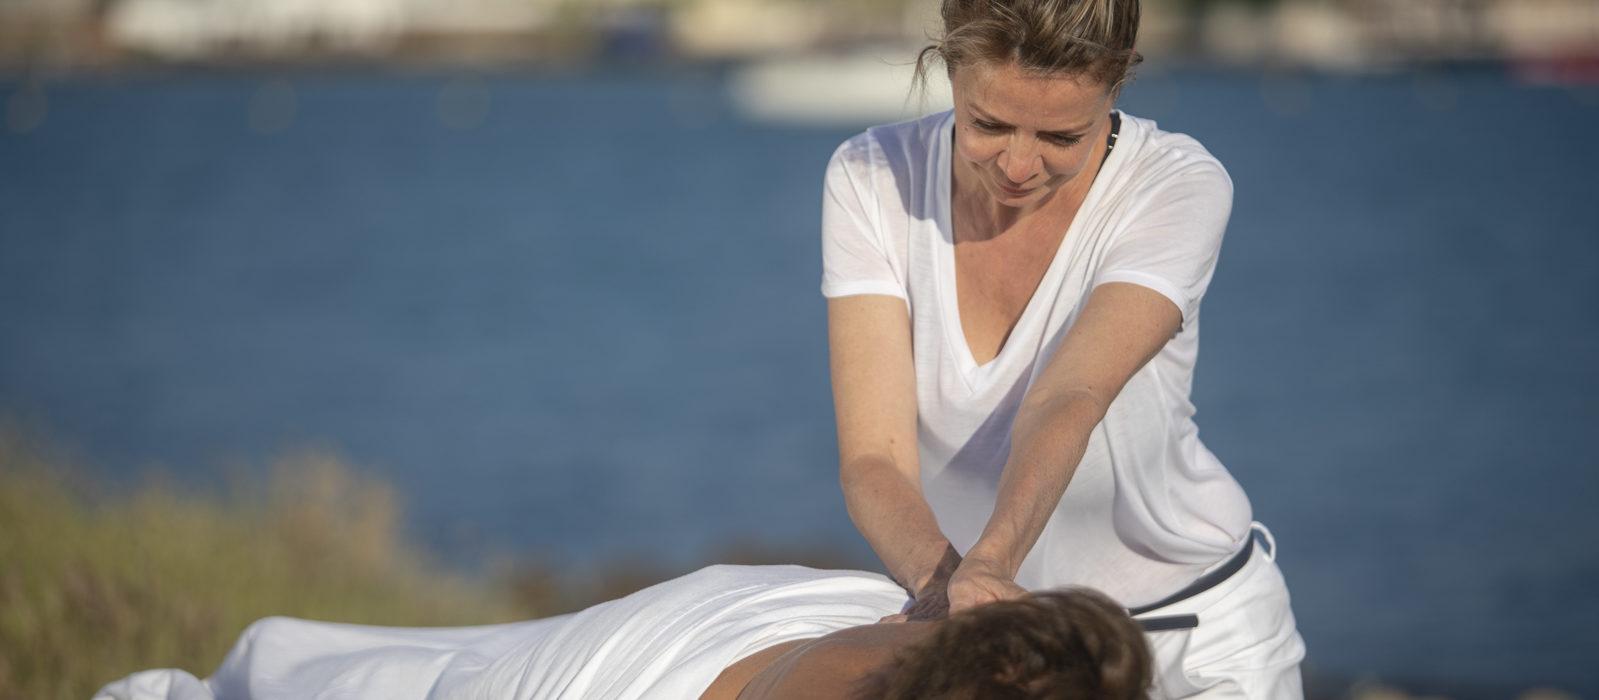 Massage Monaco sur yatch